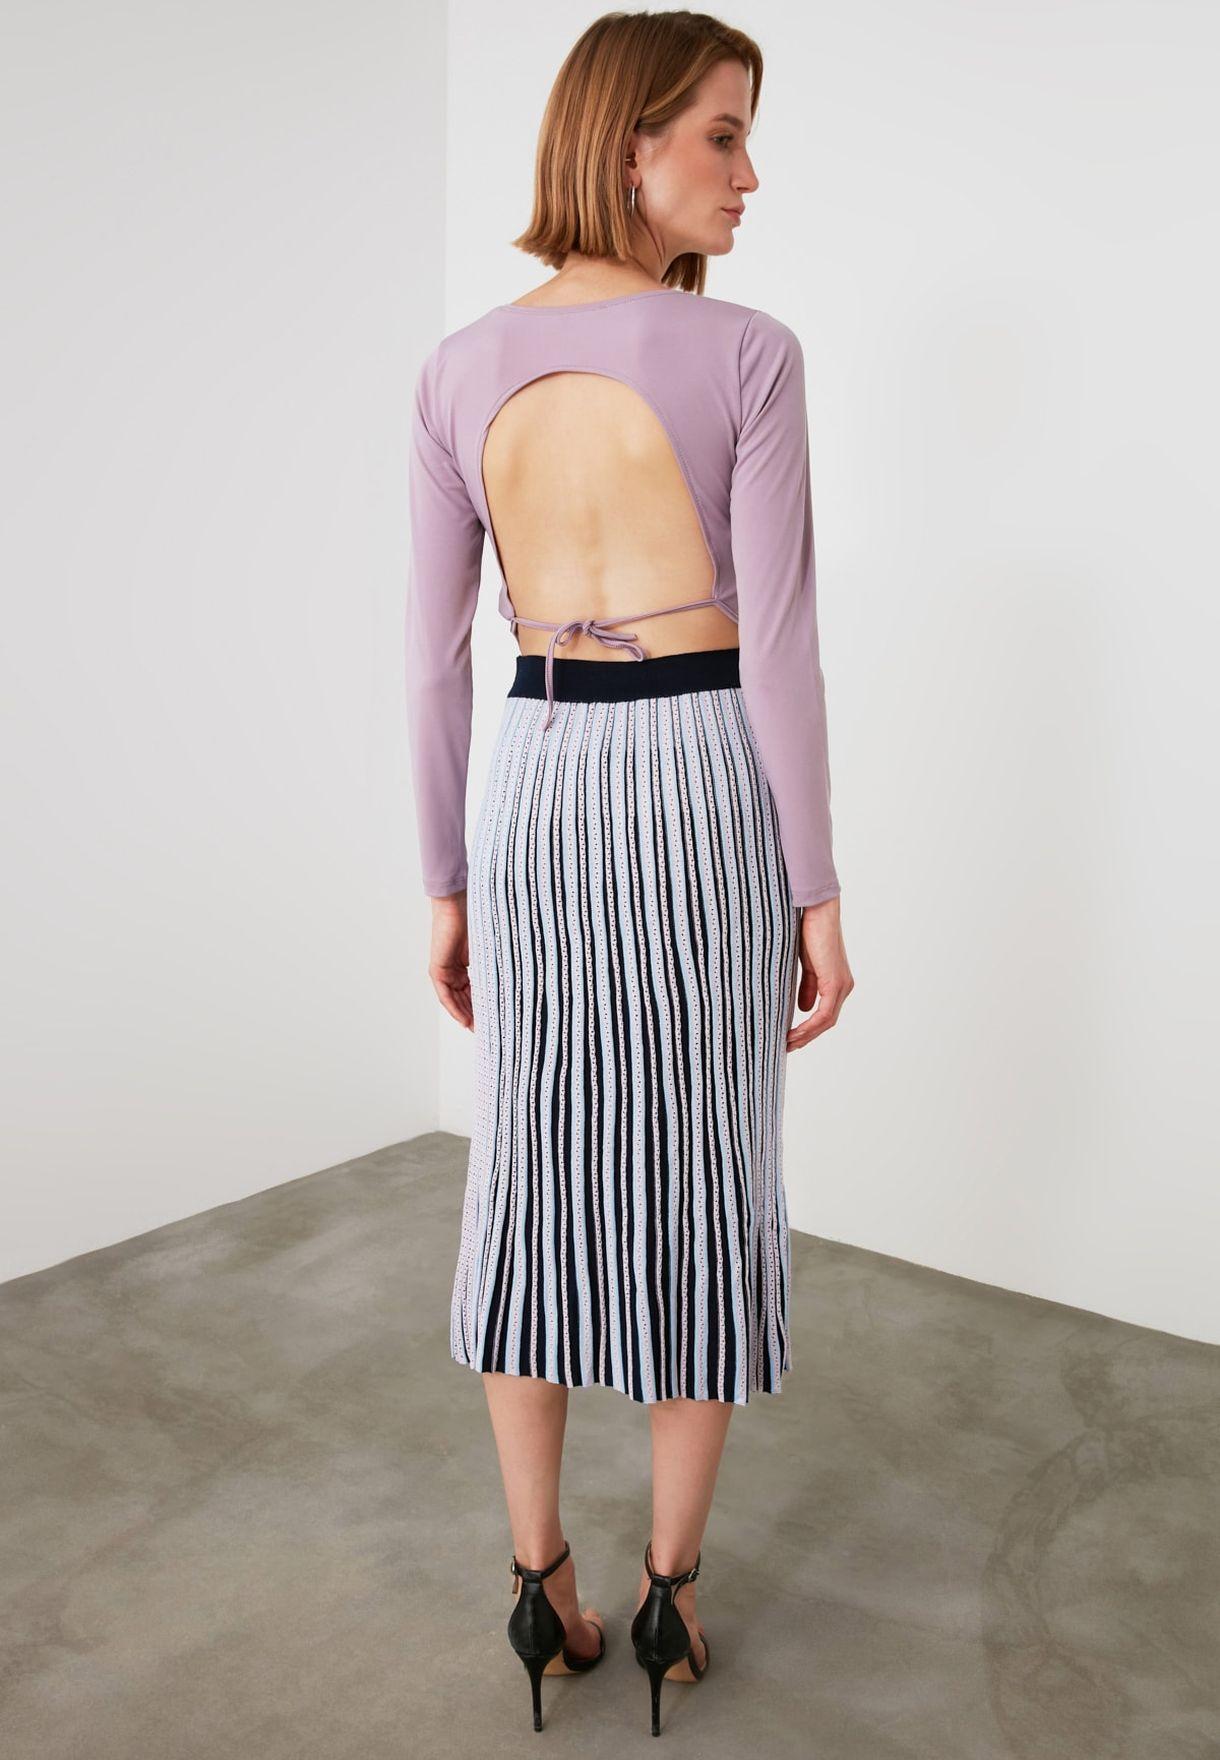 Openwork Knitted Skirt